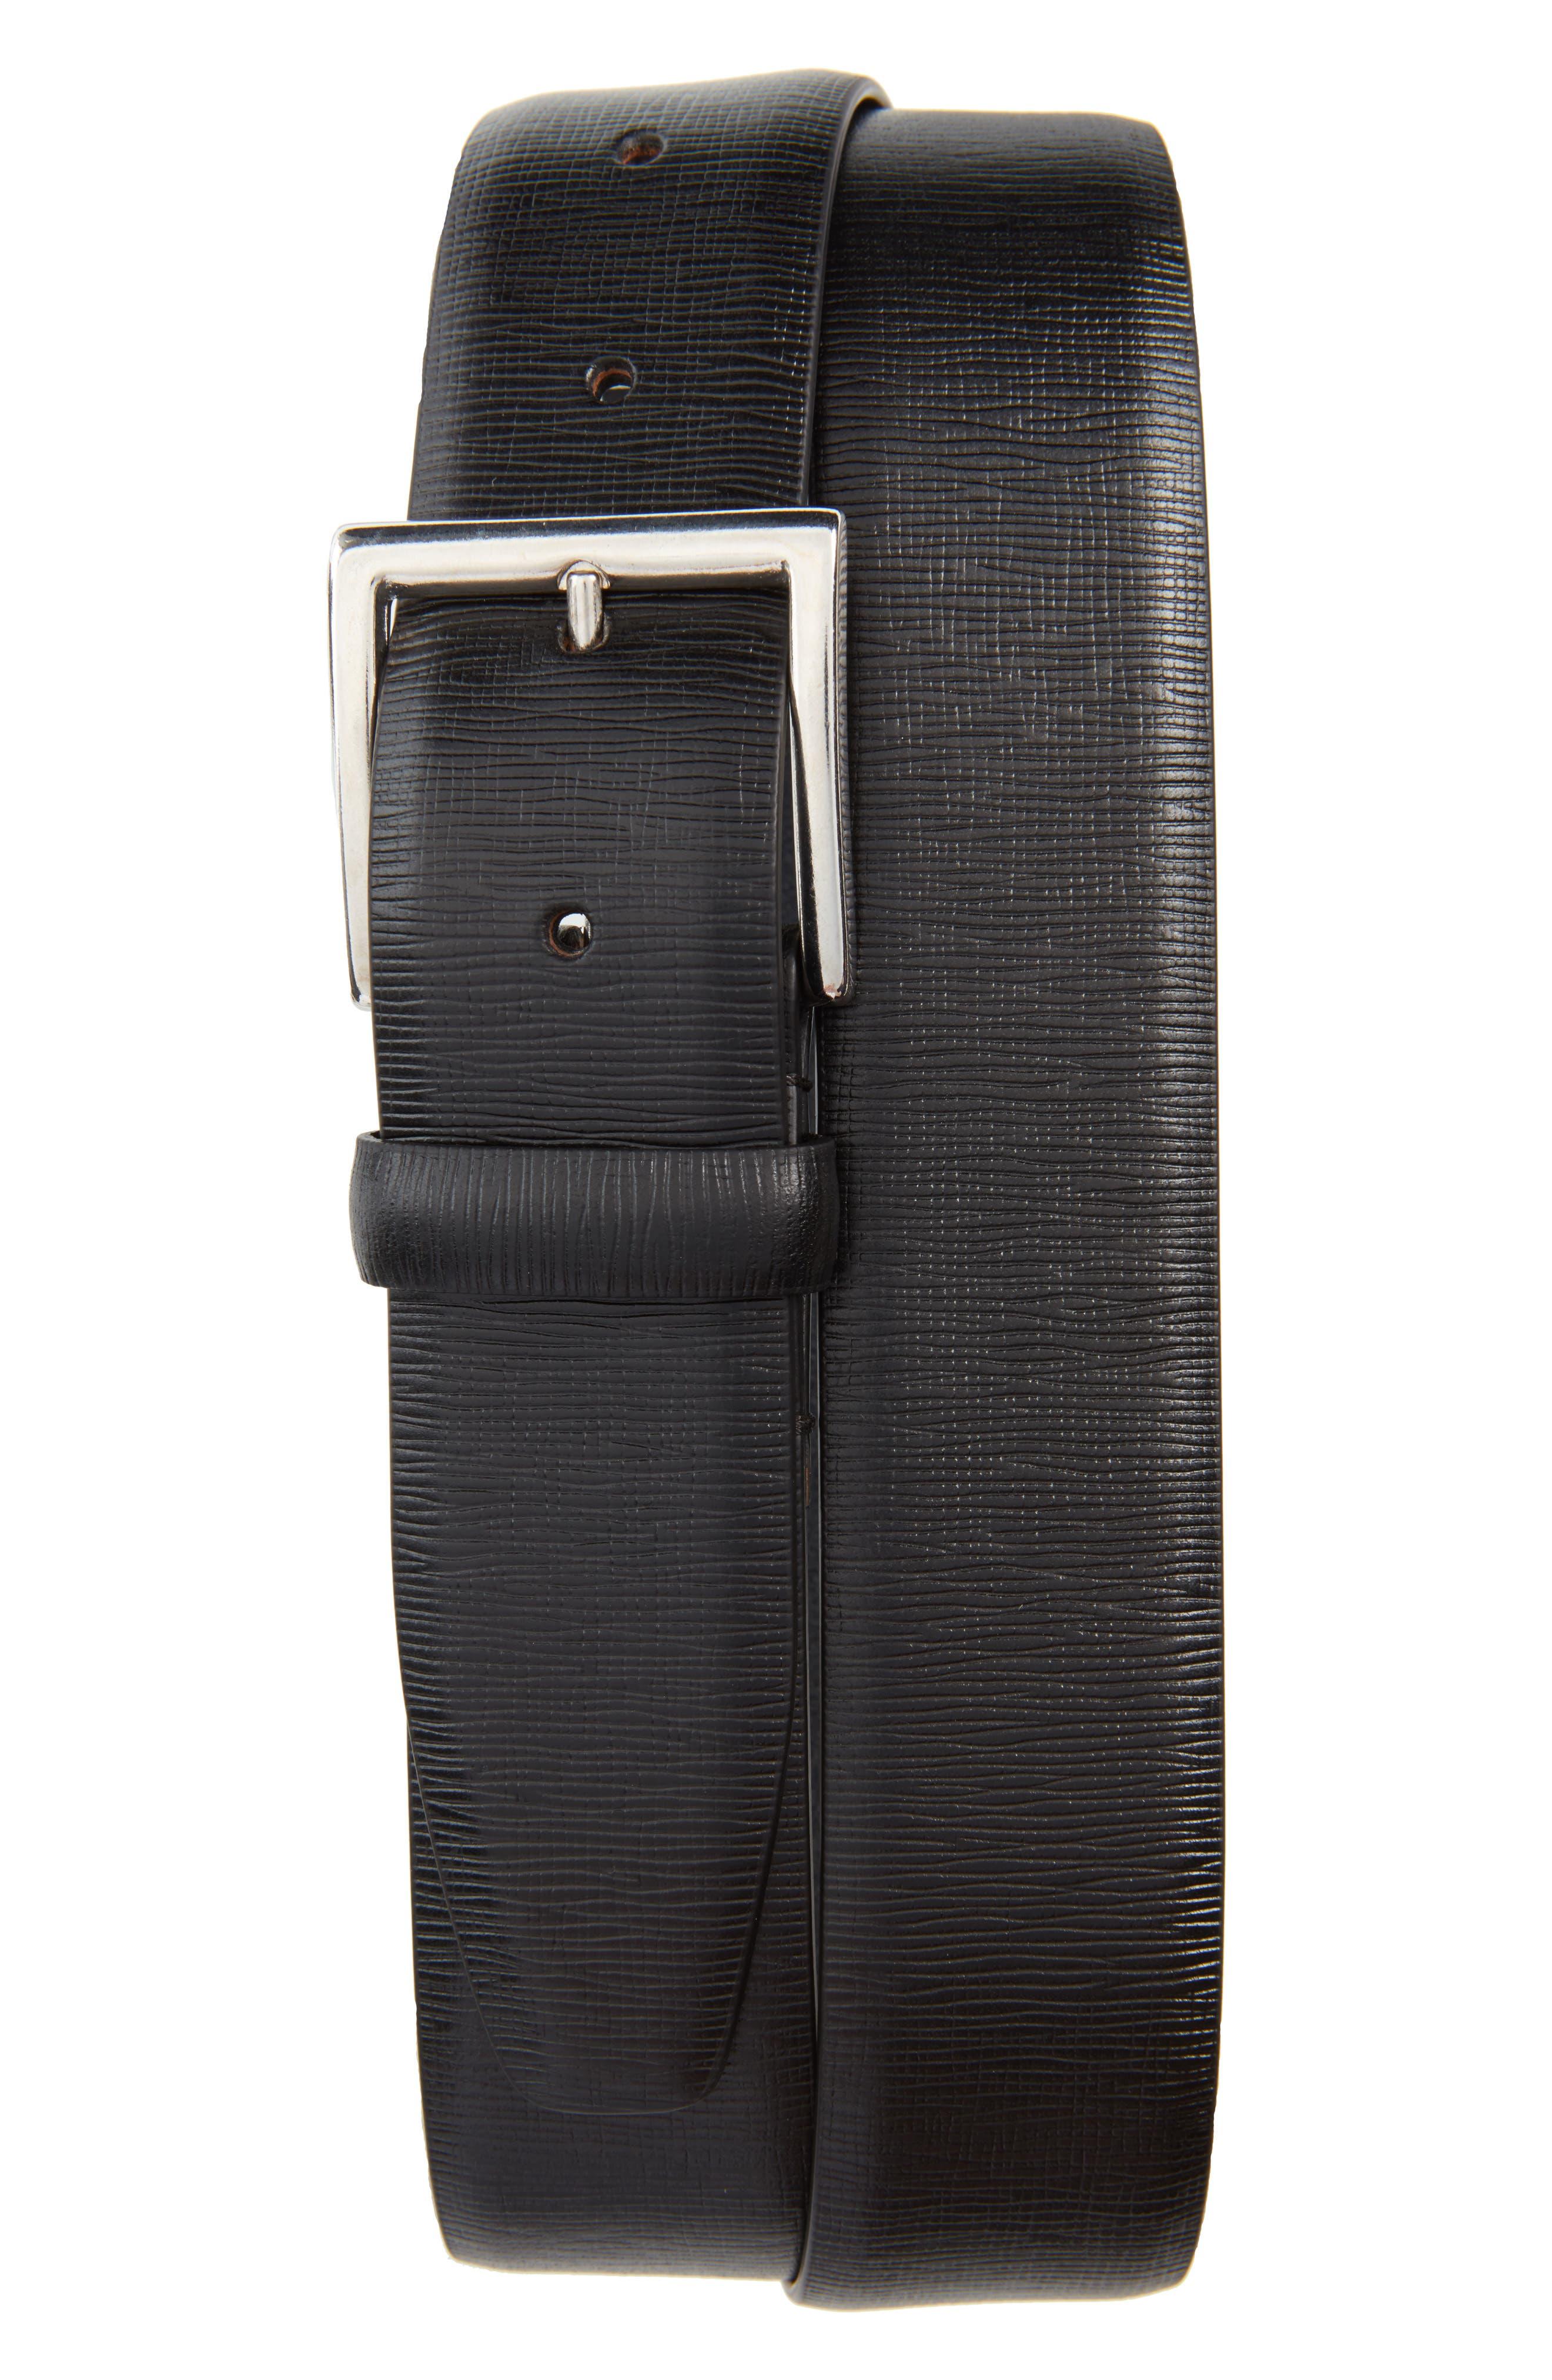 Rodd & Gunn Baywater Avenue Leather Belt